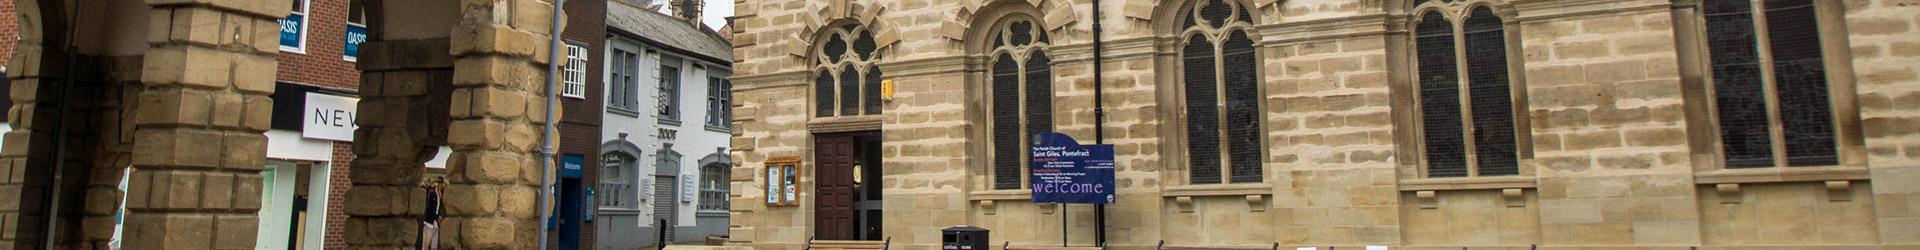 St Giles' Centre